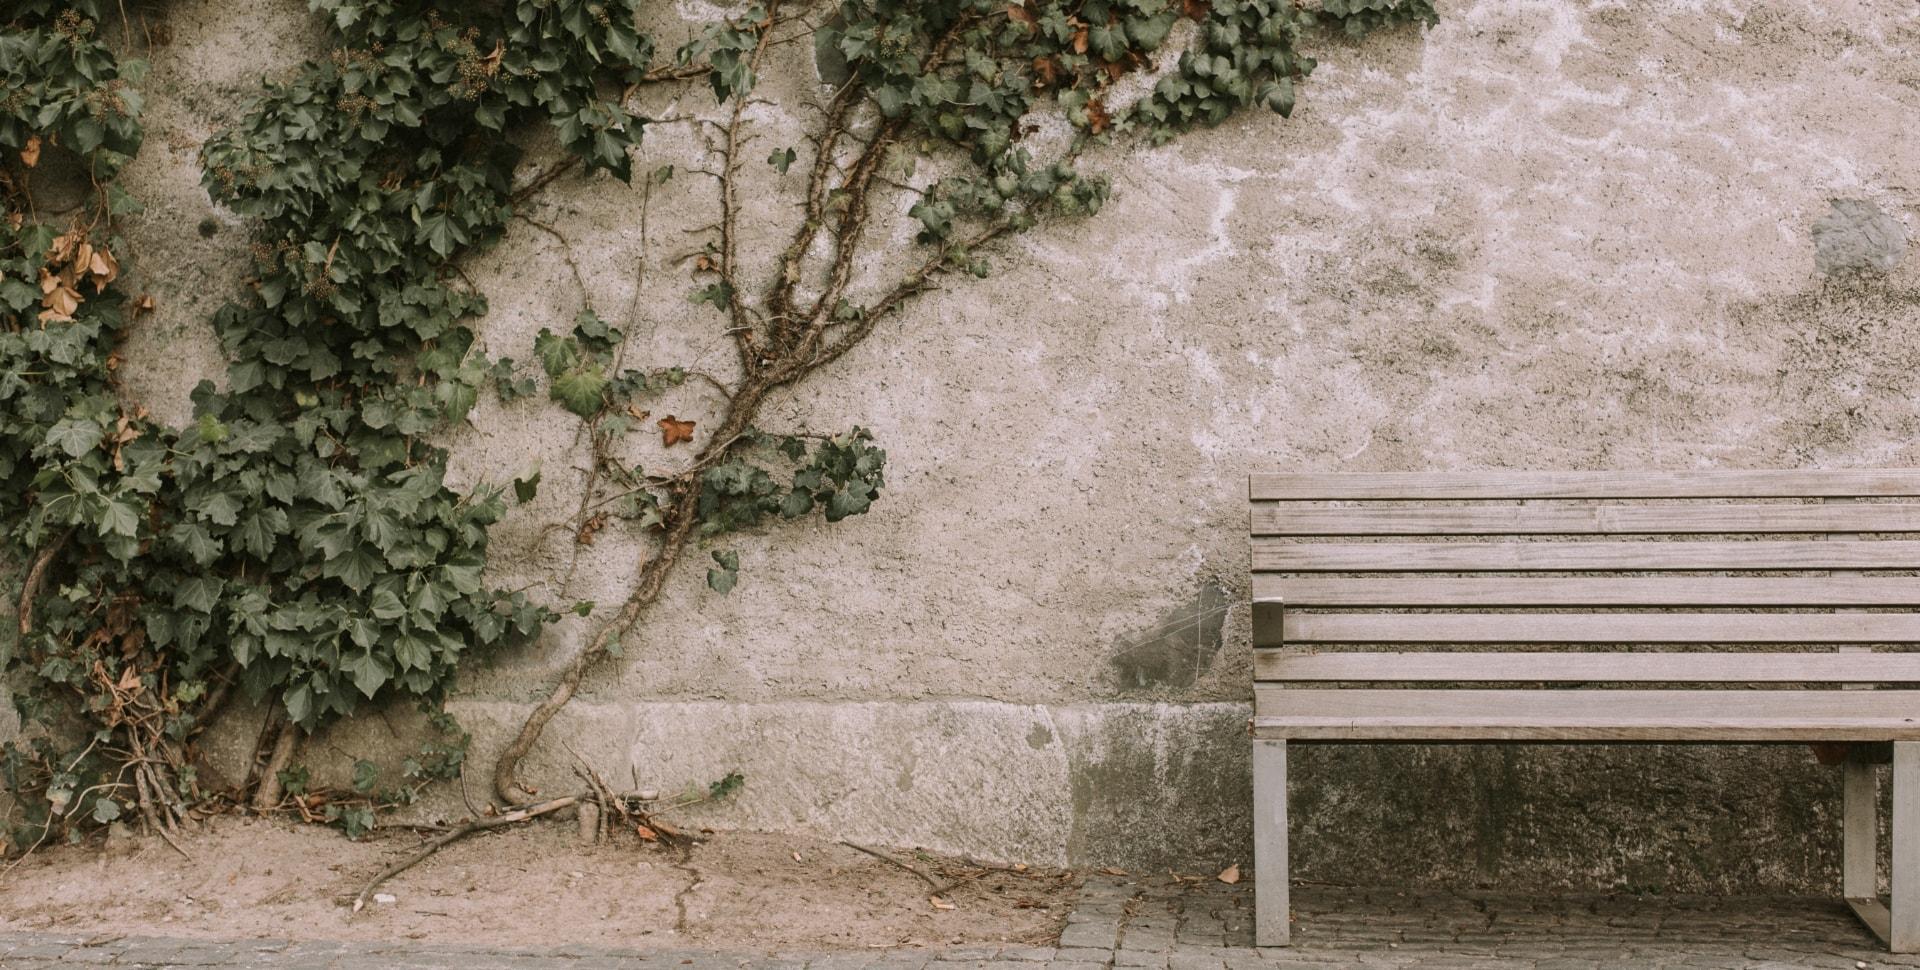 Wann sind Antidepressiva sinnvoll?